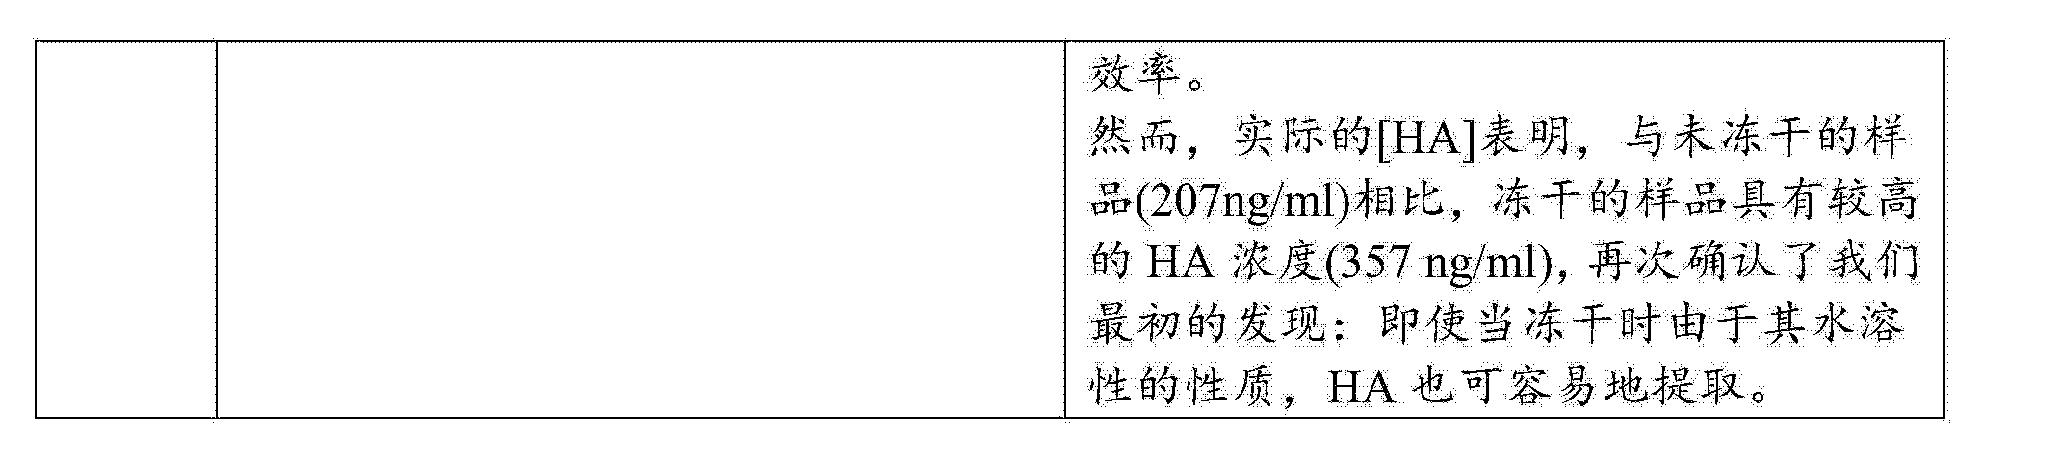 Figure CN103874762AD00671